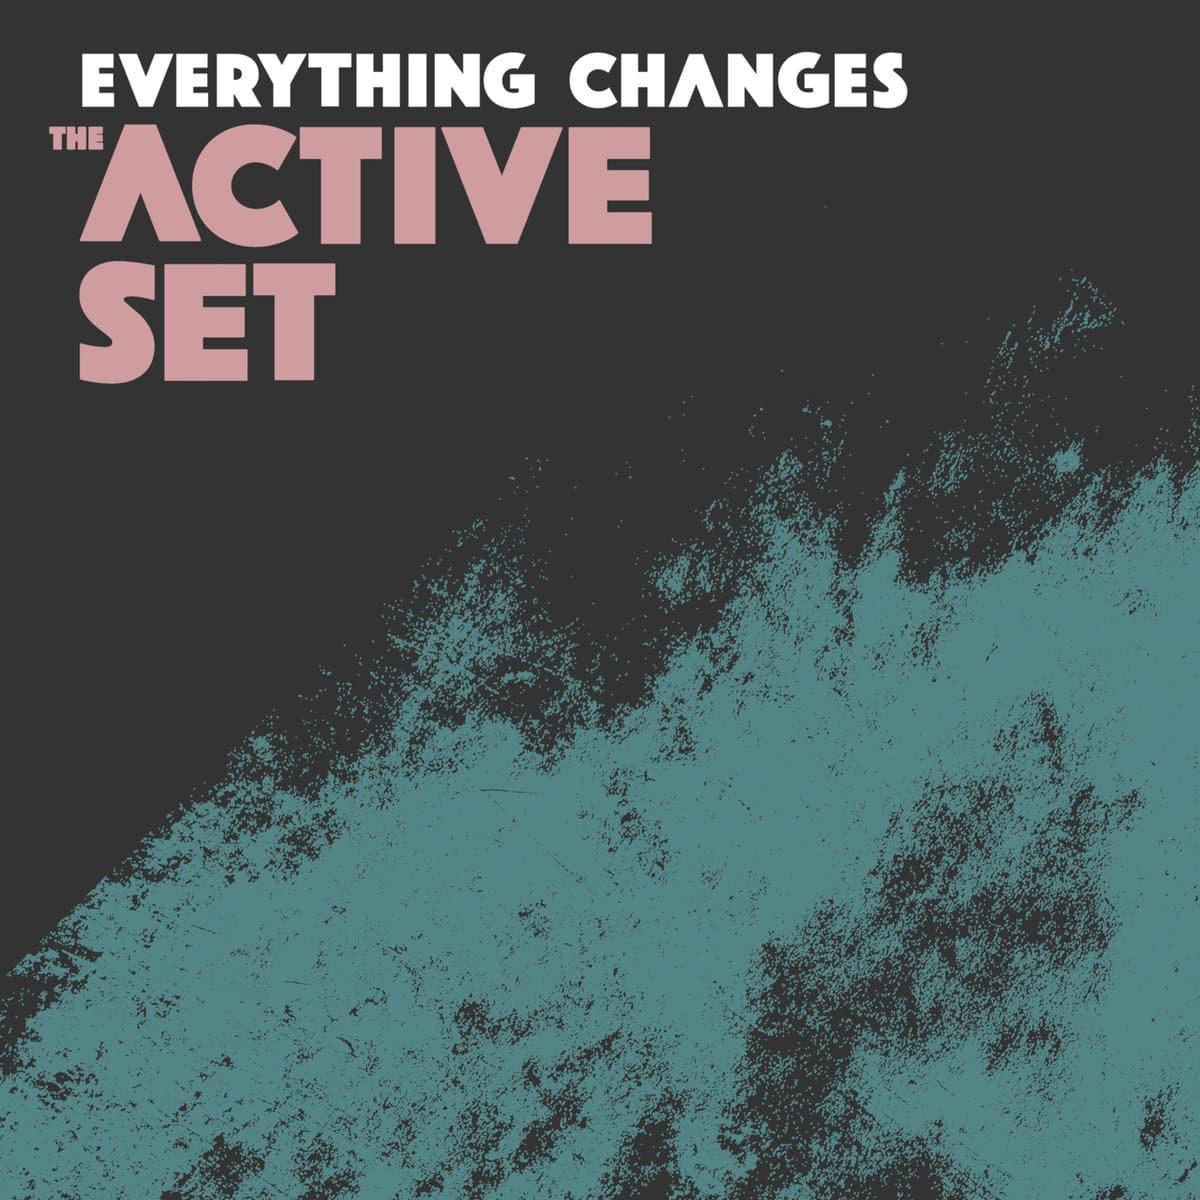 The Active Set